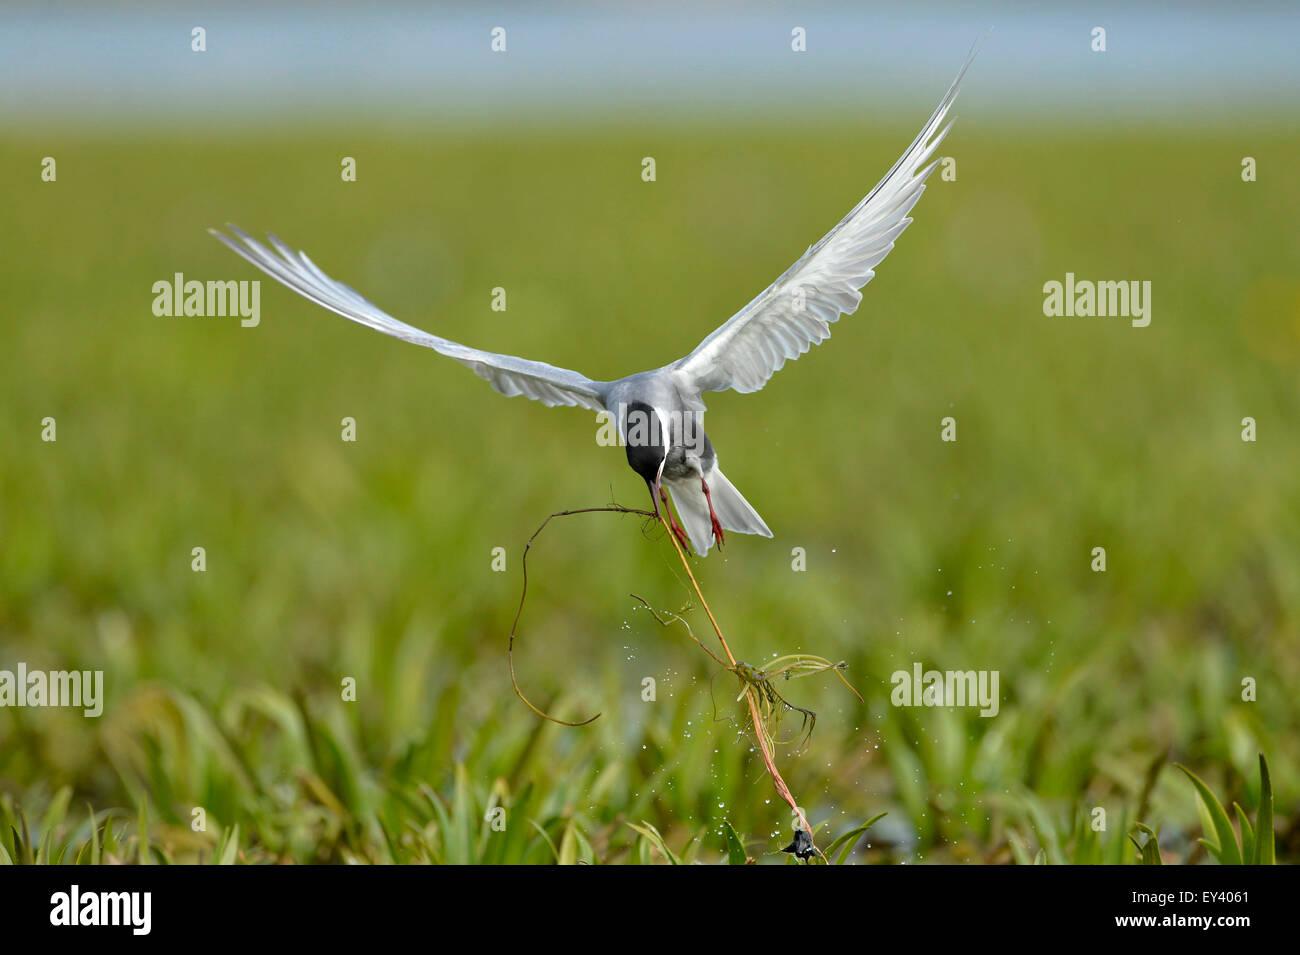 Whiskered Tern (Chlidonias hybrida) adult in breeding plumage, in flight tugging at vegetation, Danube delta, Romania, - Stock Image